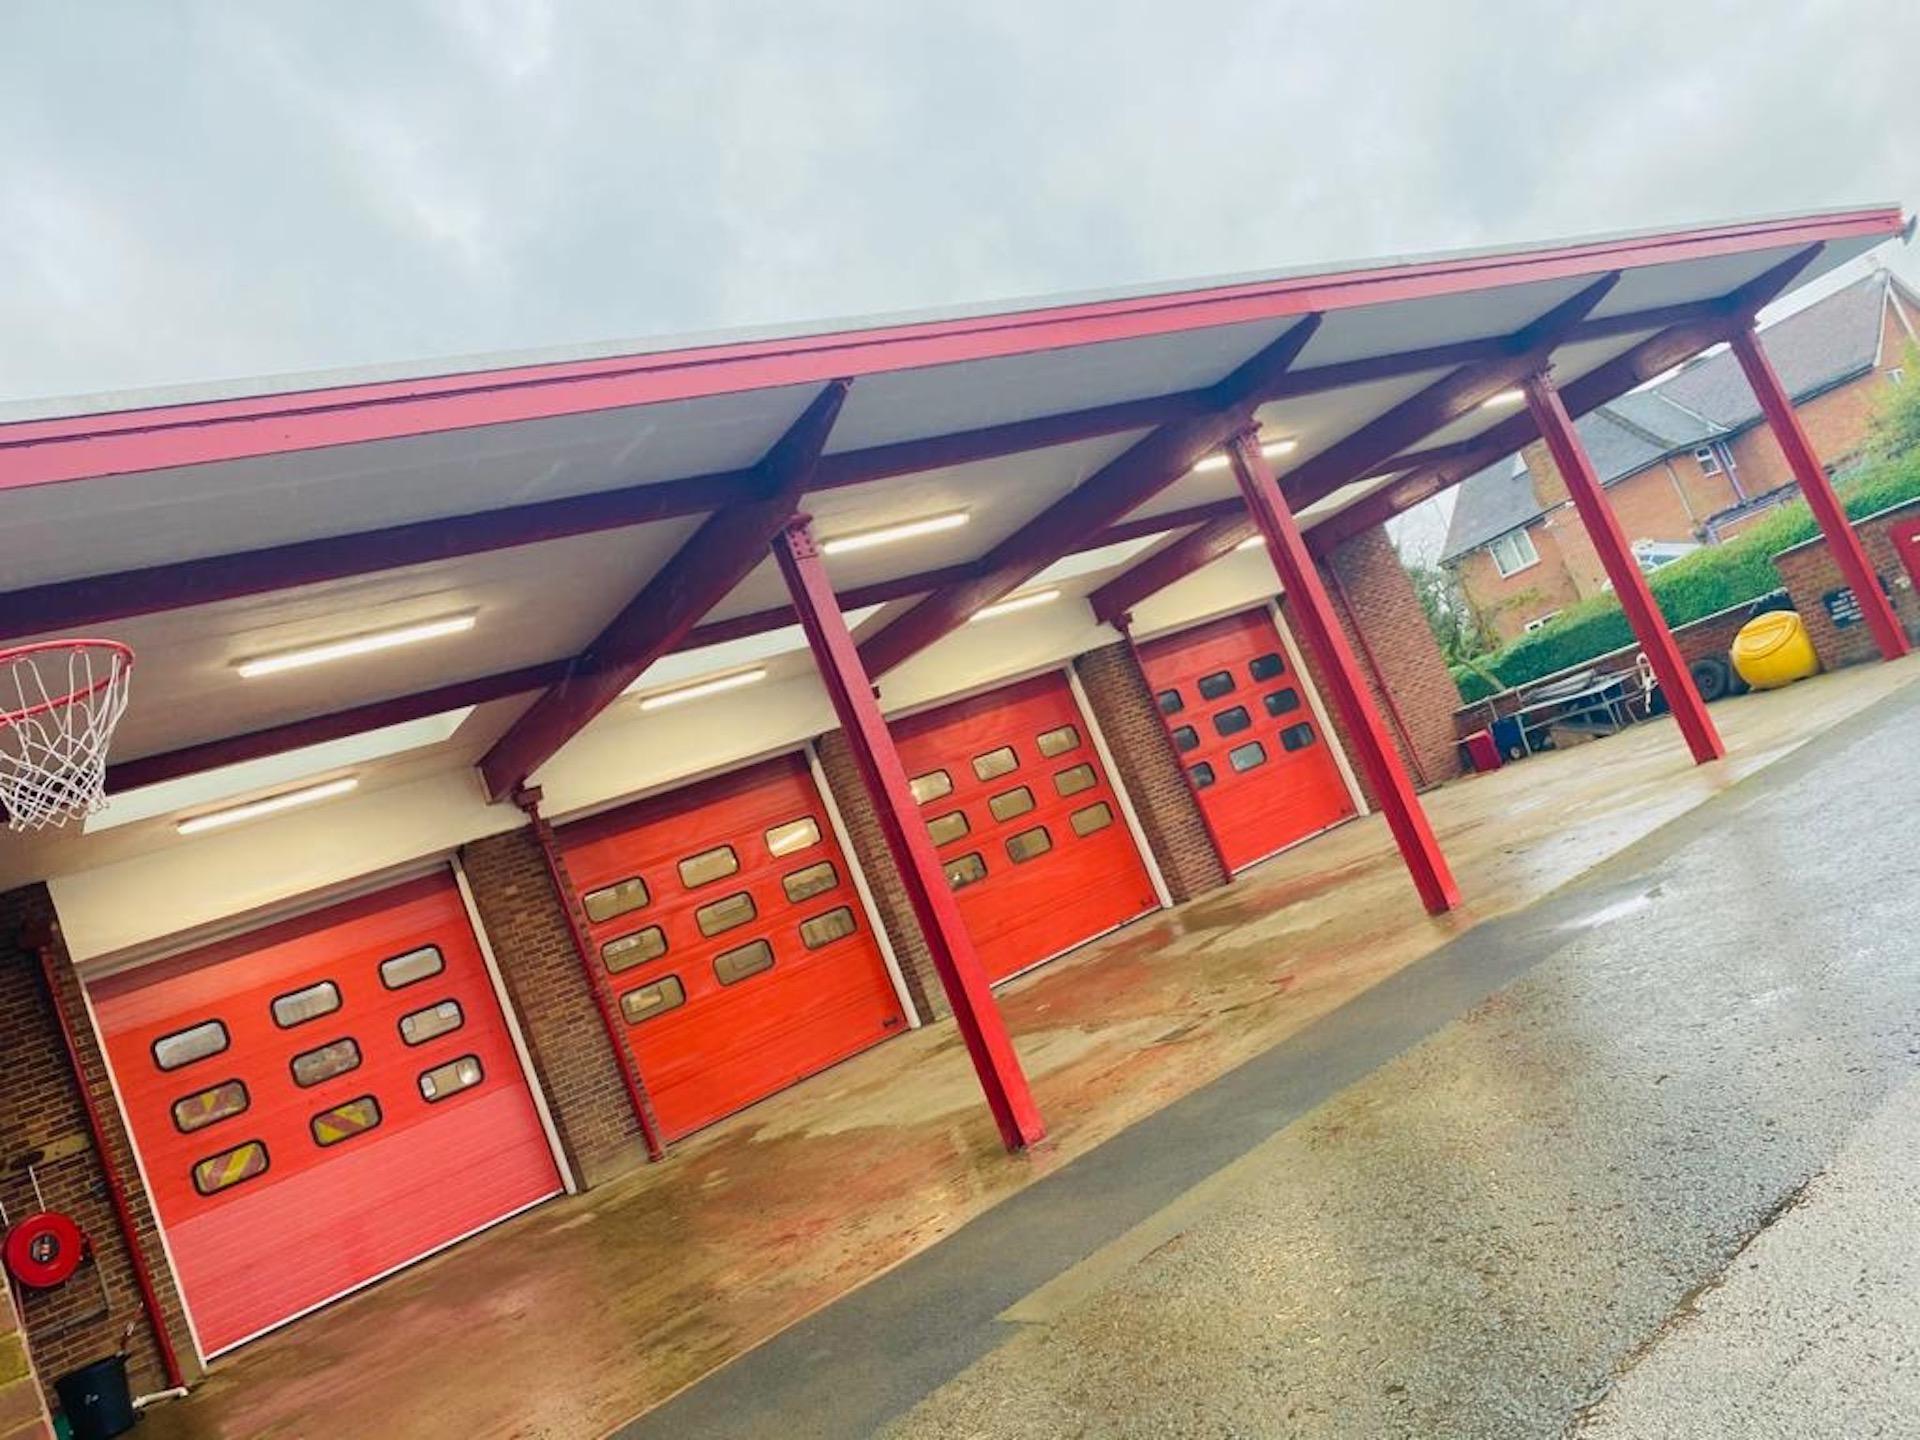 moortown fire station – phase ii – refurbishment works 1